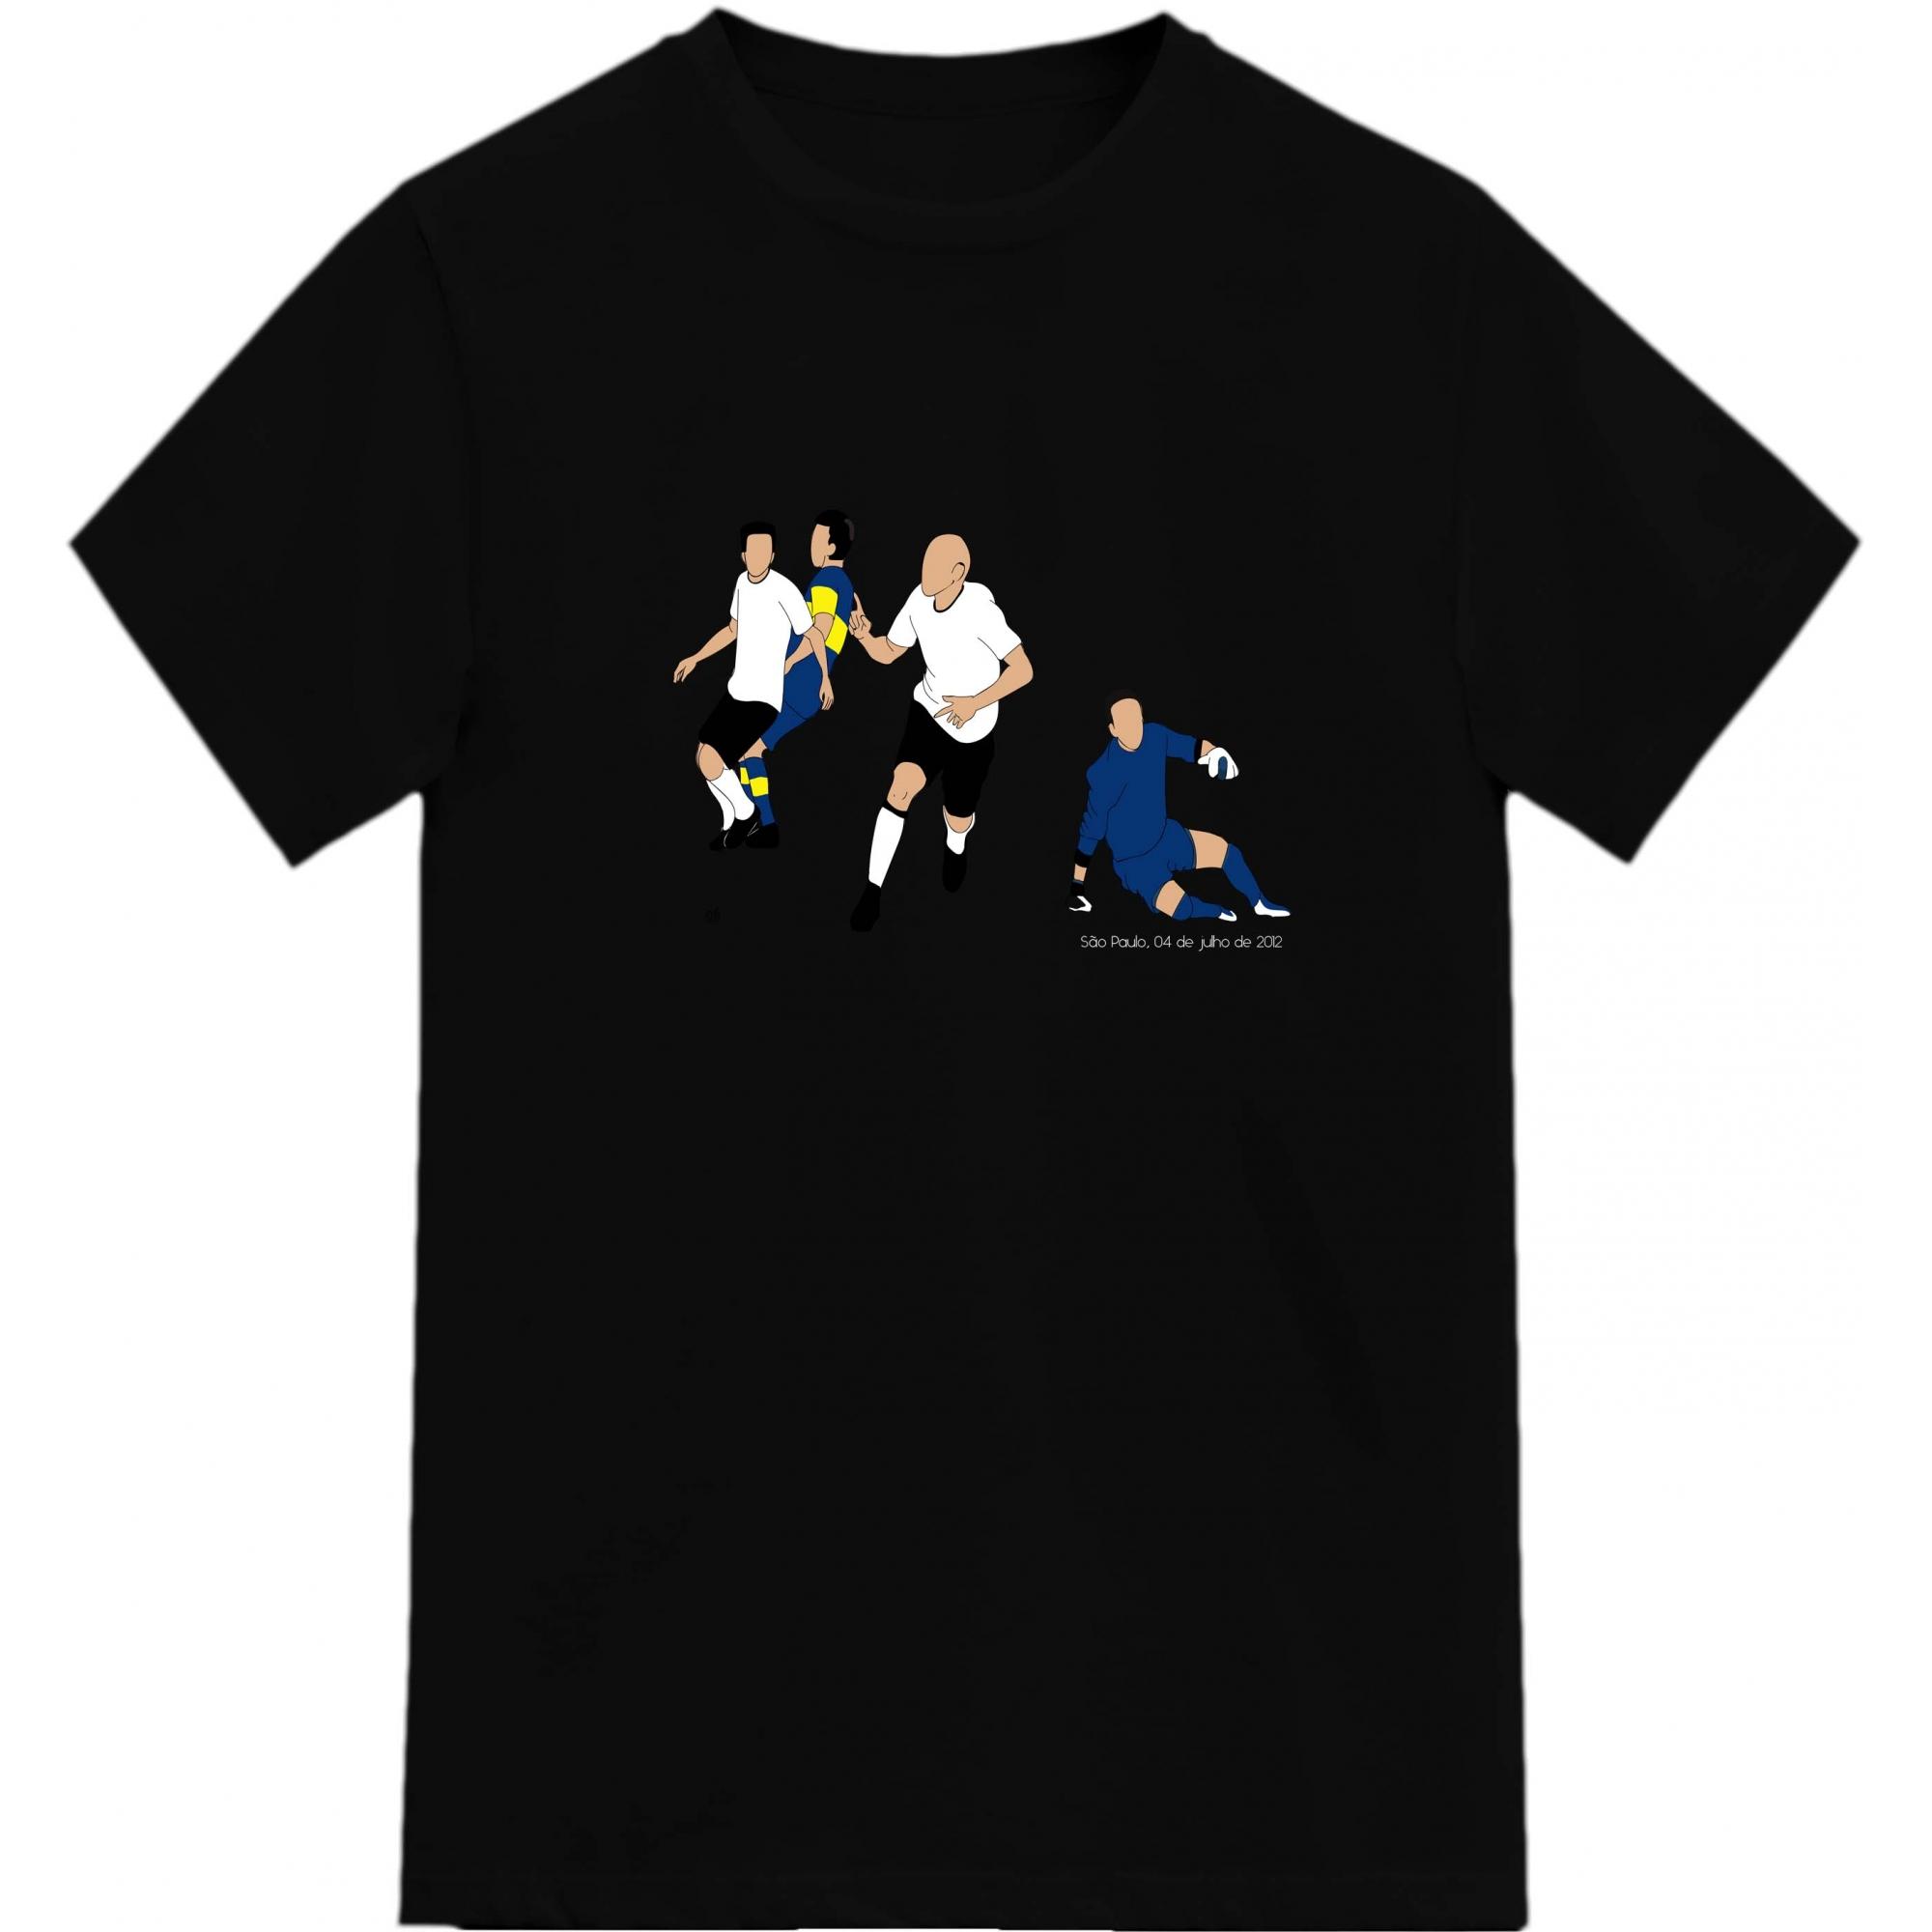 Camiseta Fim do Tabu...Invicto OUTLET